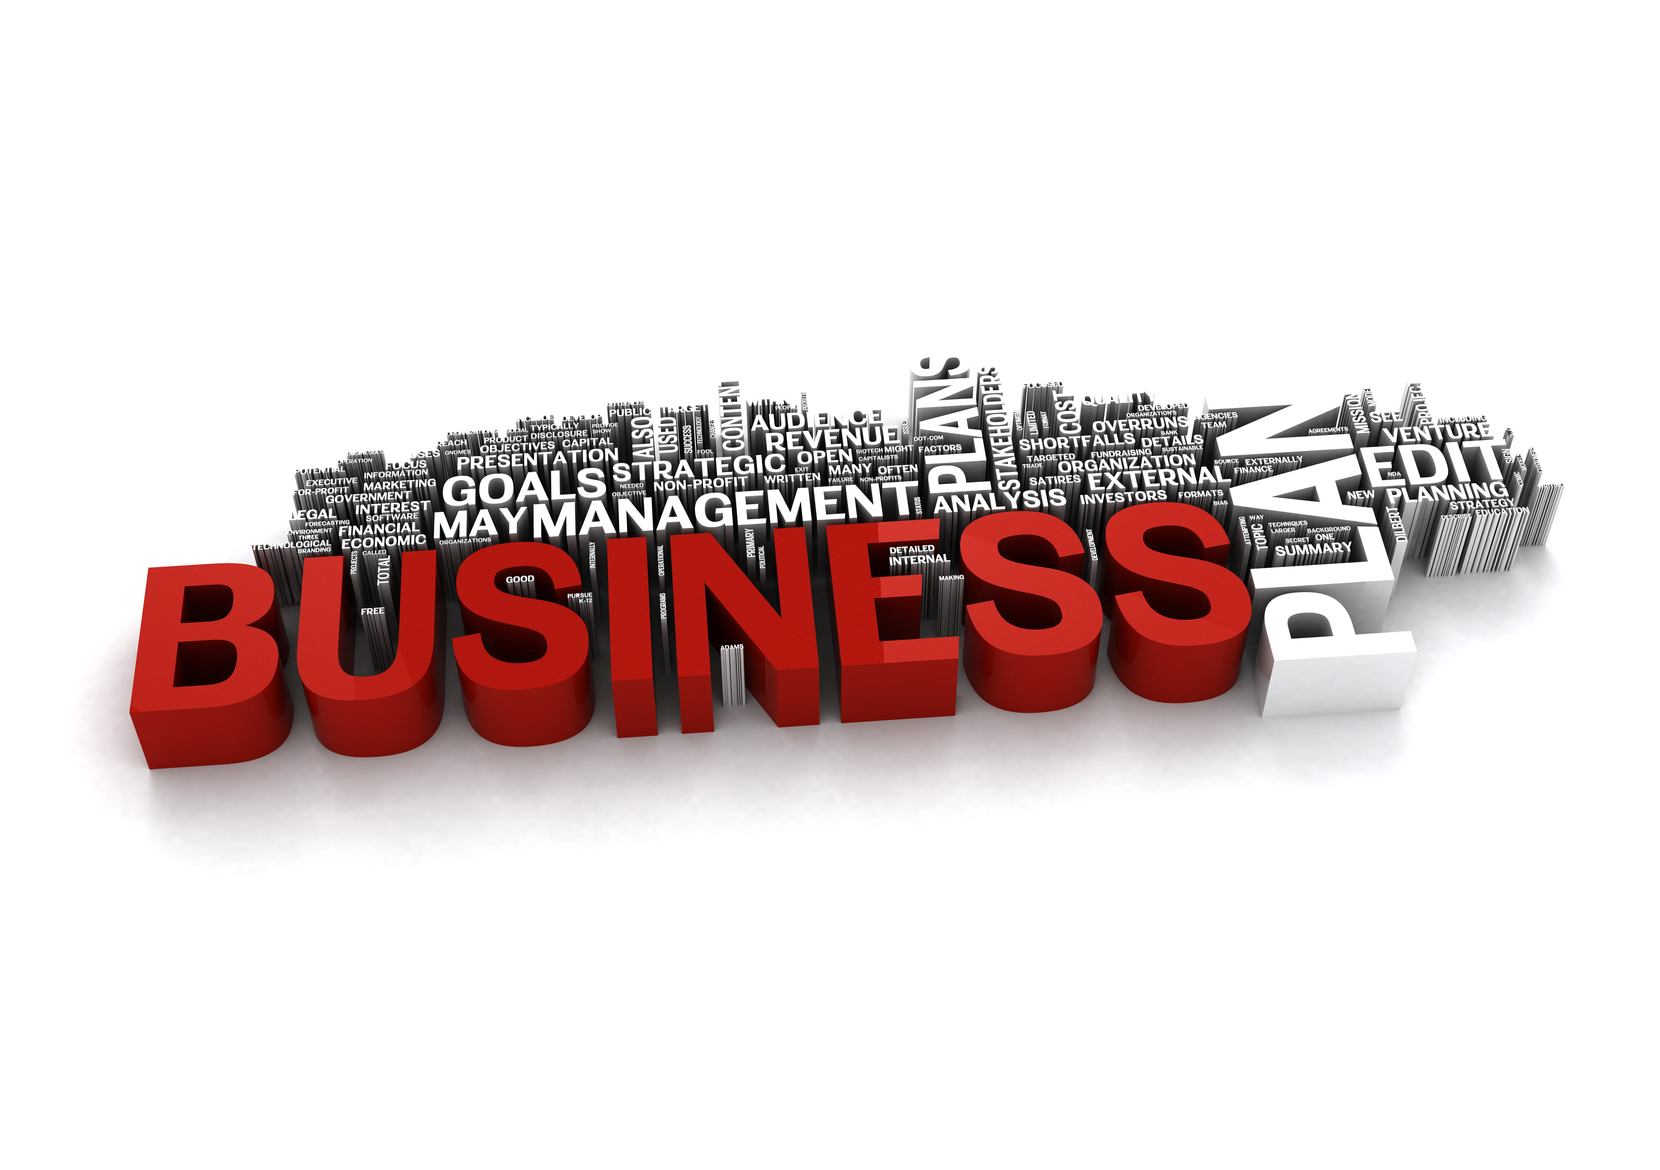 The big business plan checklist